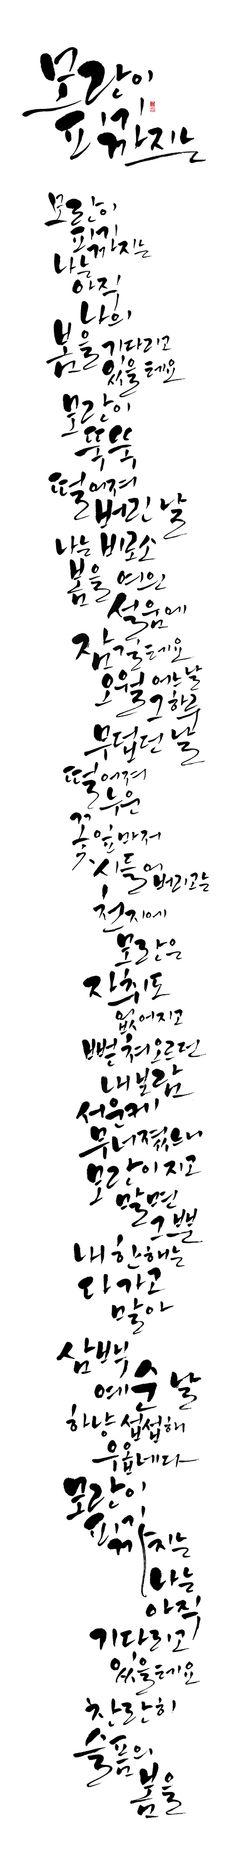 calligraphy_모란이 피기까지는_김영랑